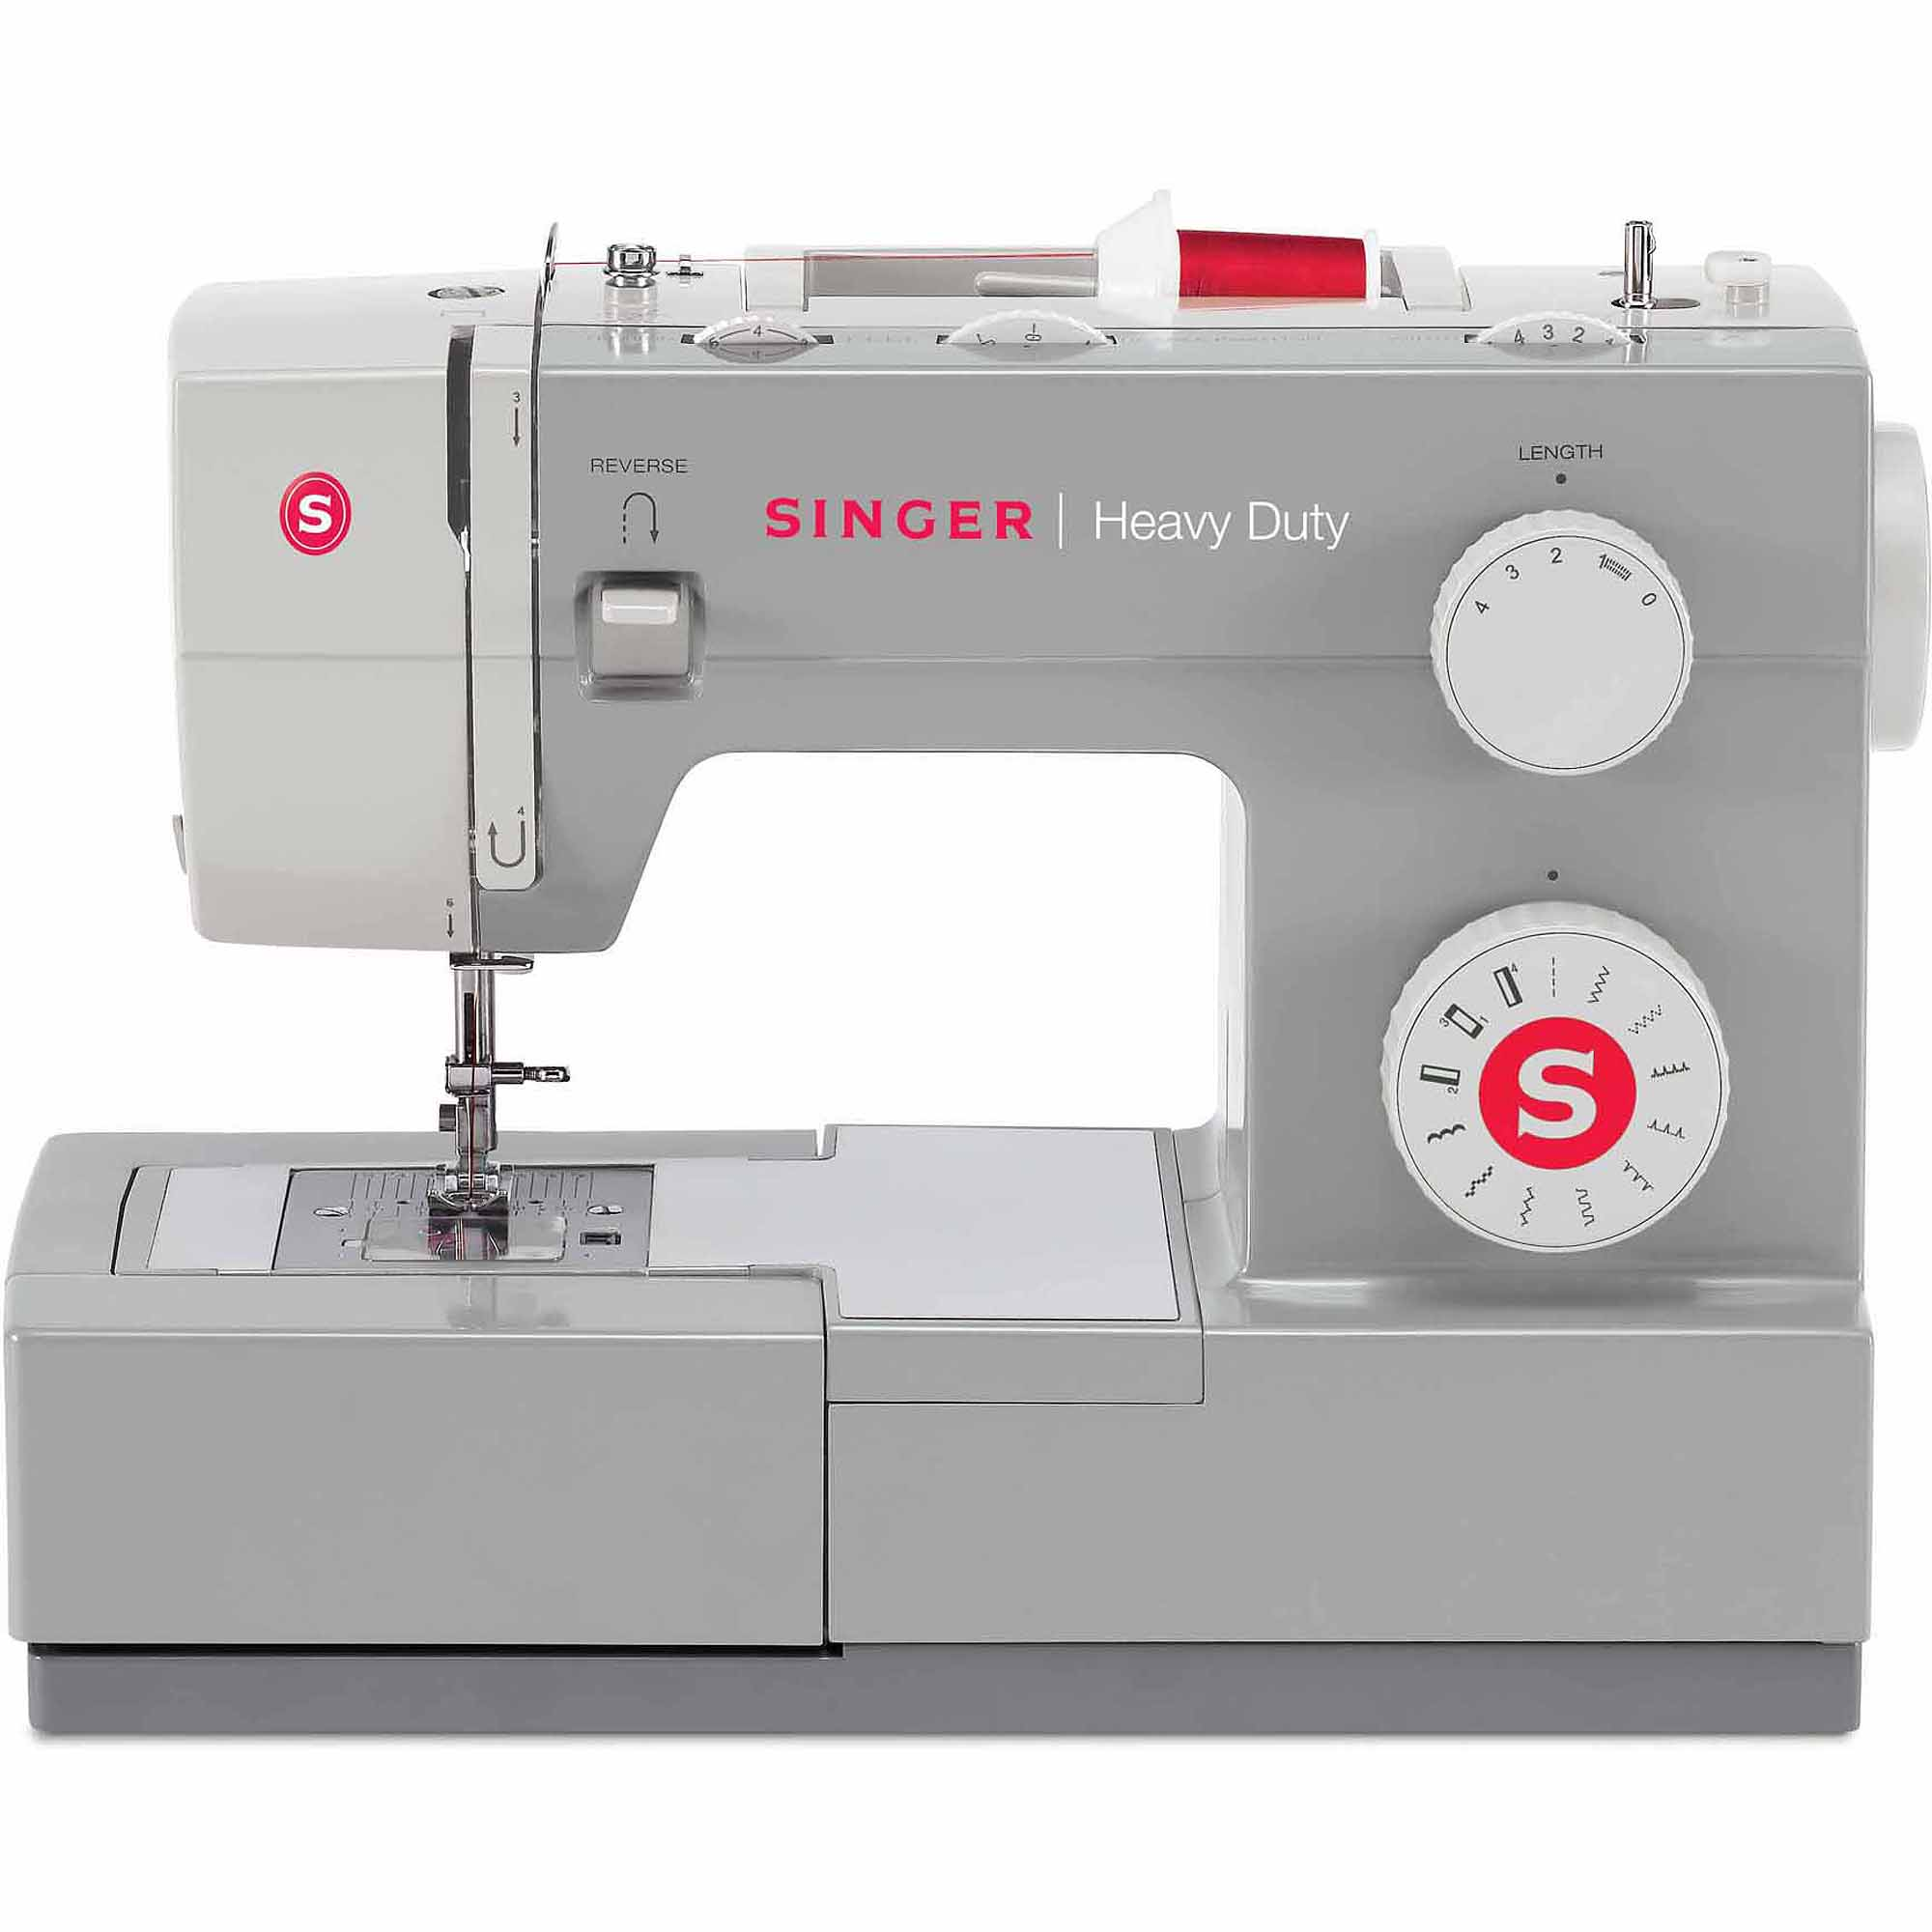 Singer 1,100-Stitch Heavy Duty Sewing Machine, 4411